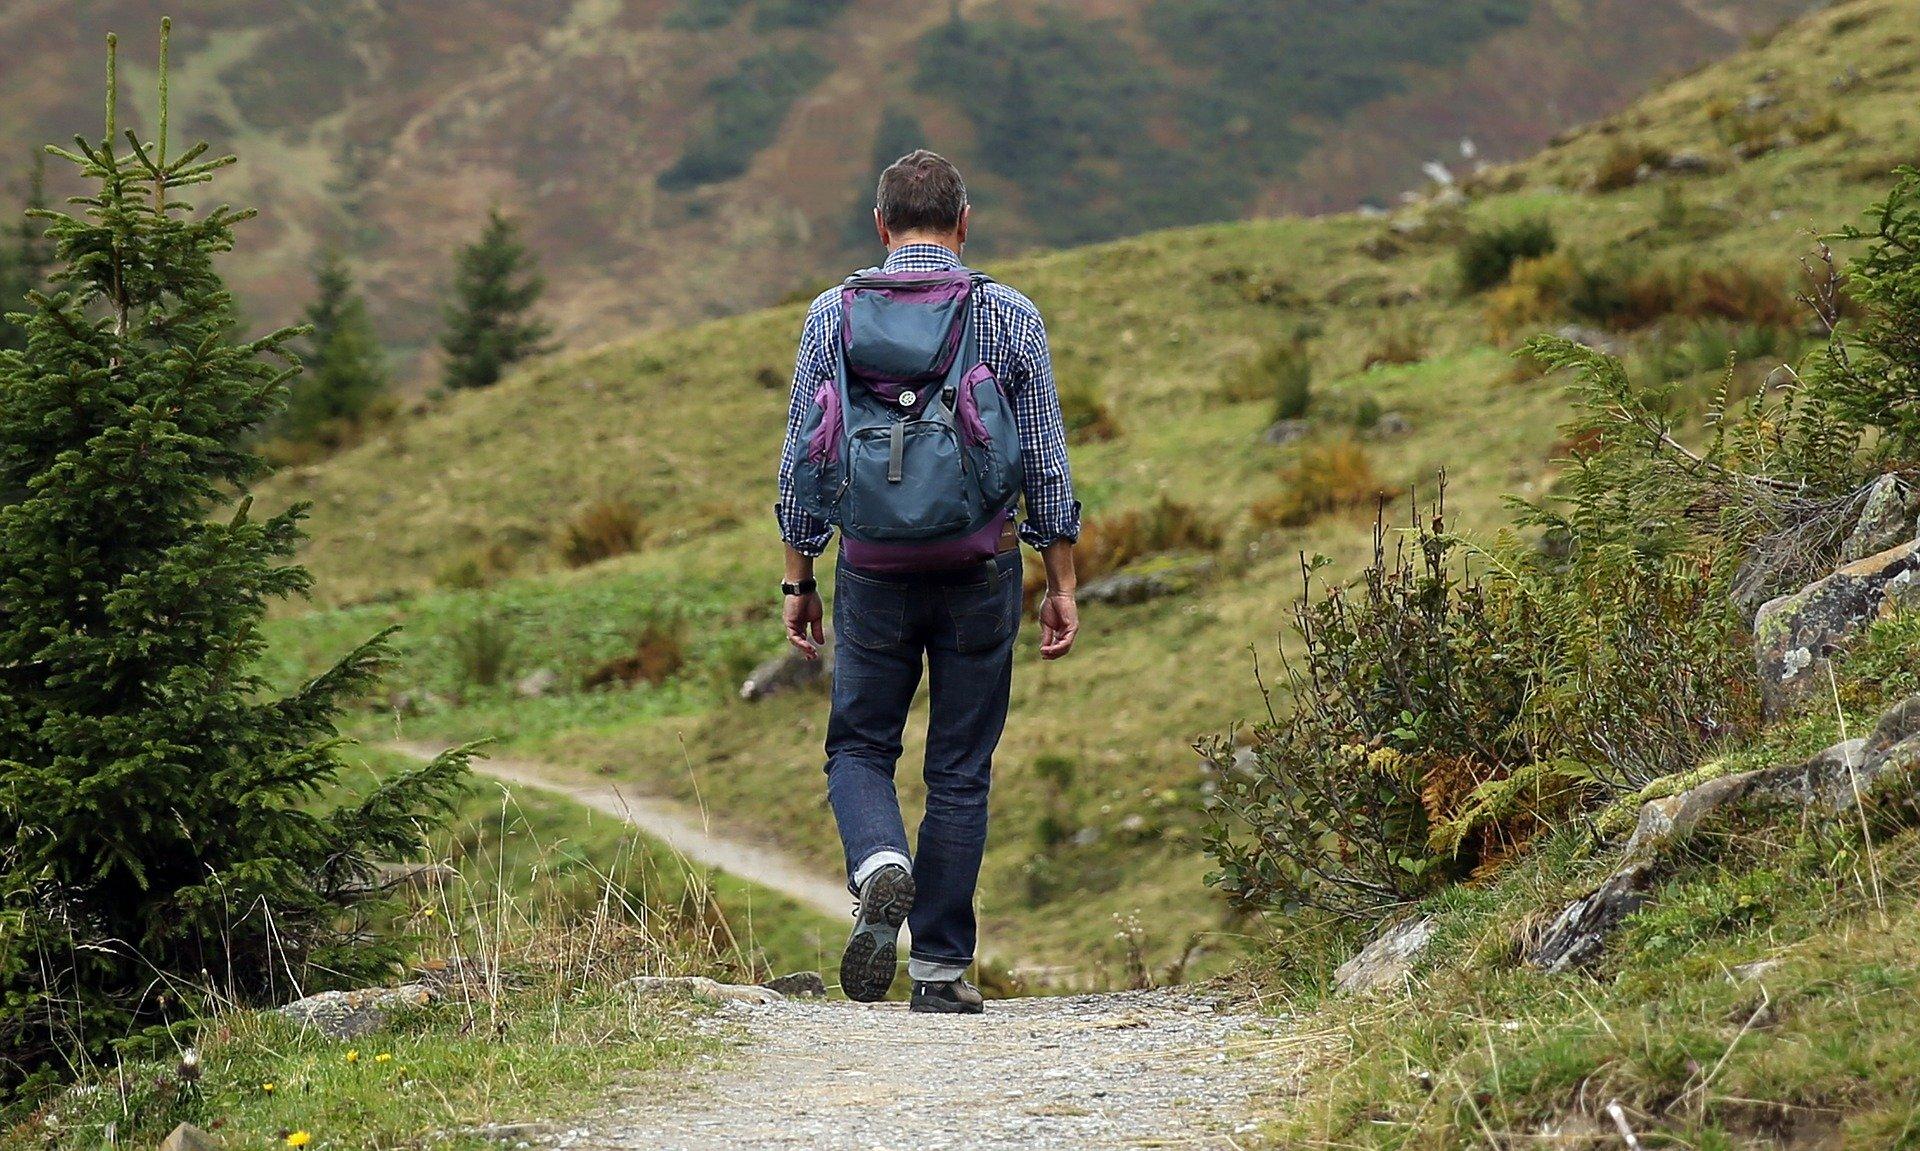 coborand de pe munte